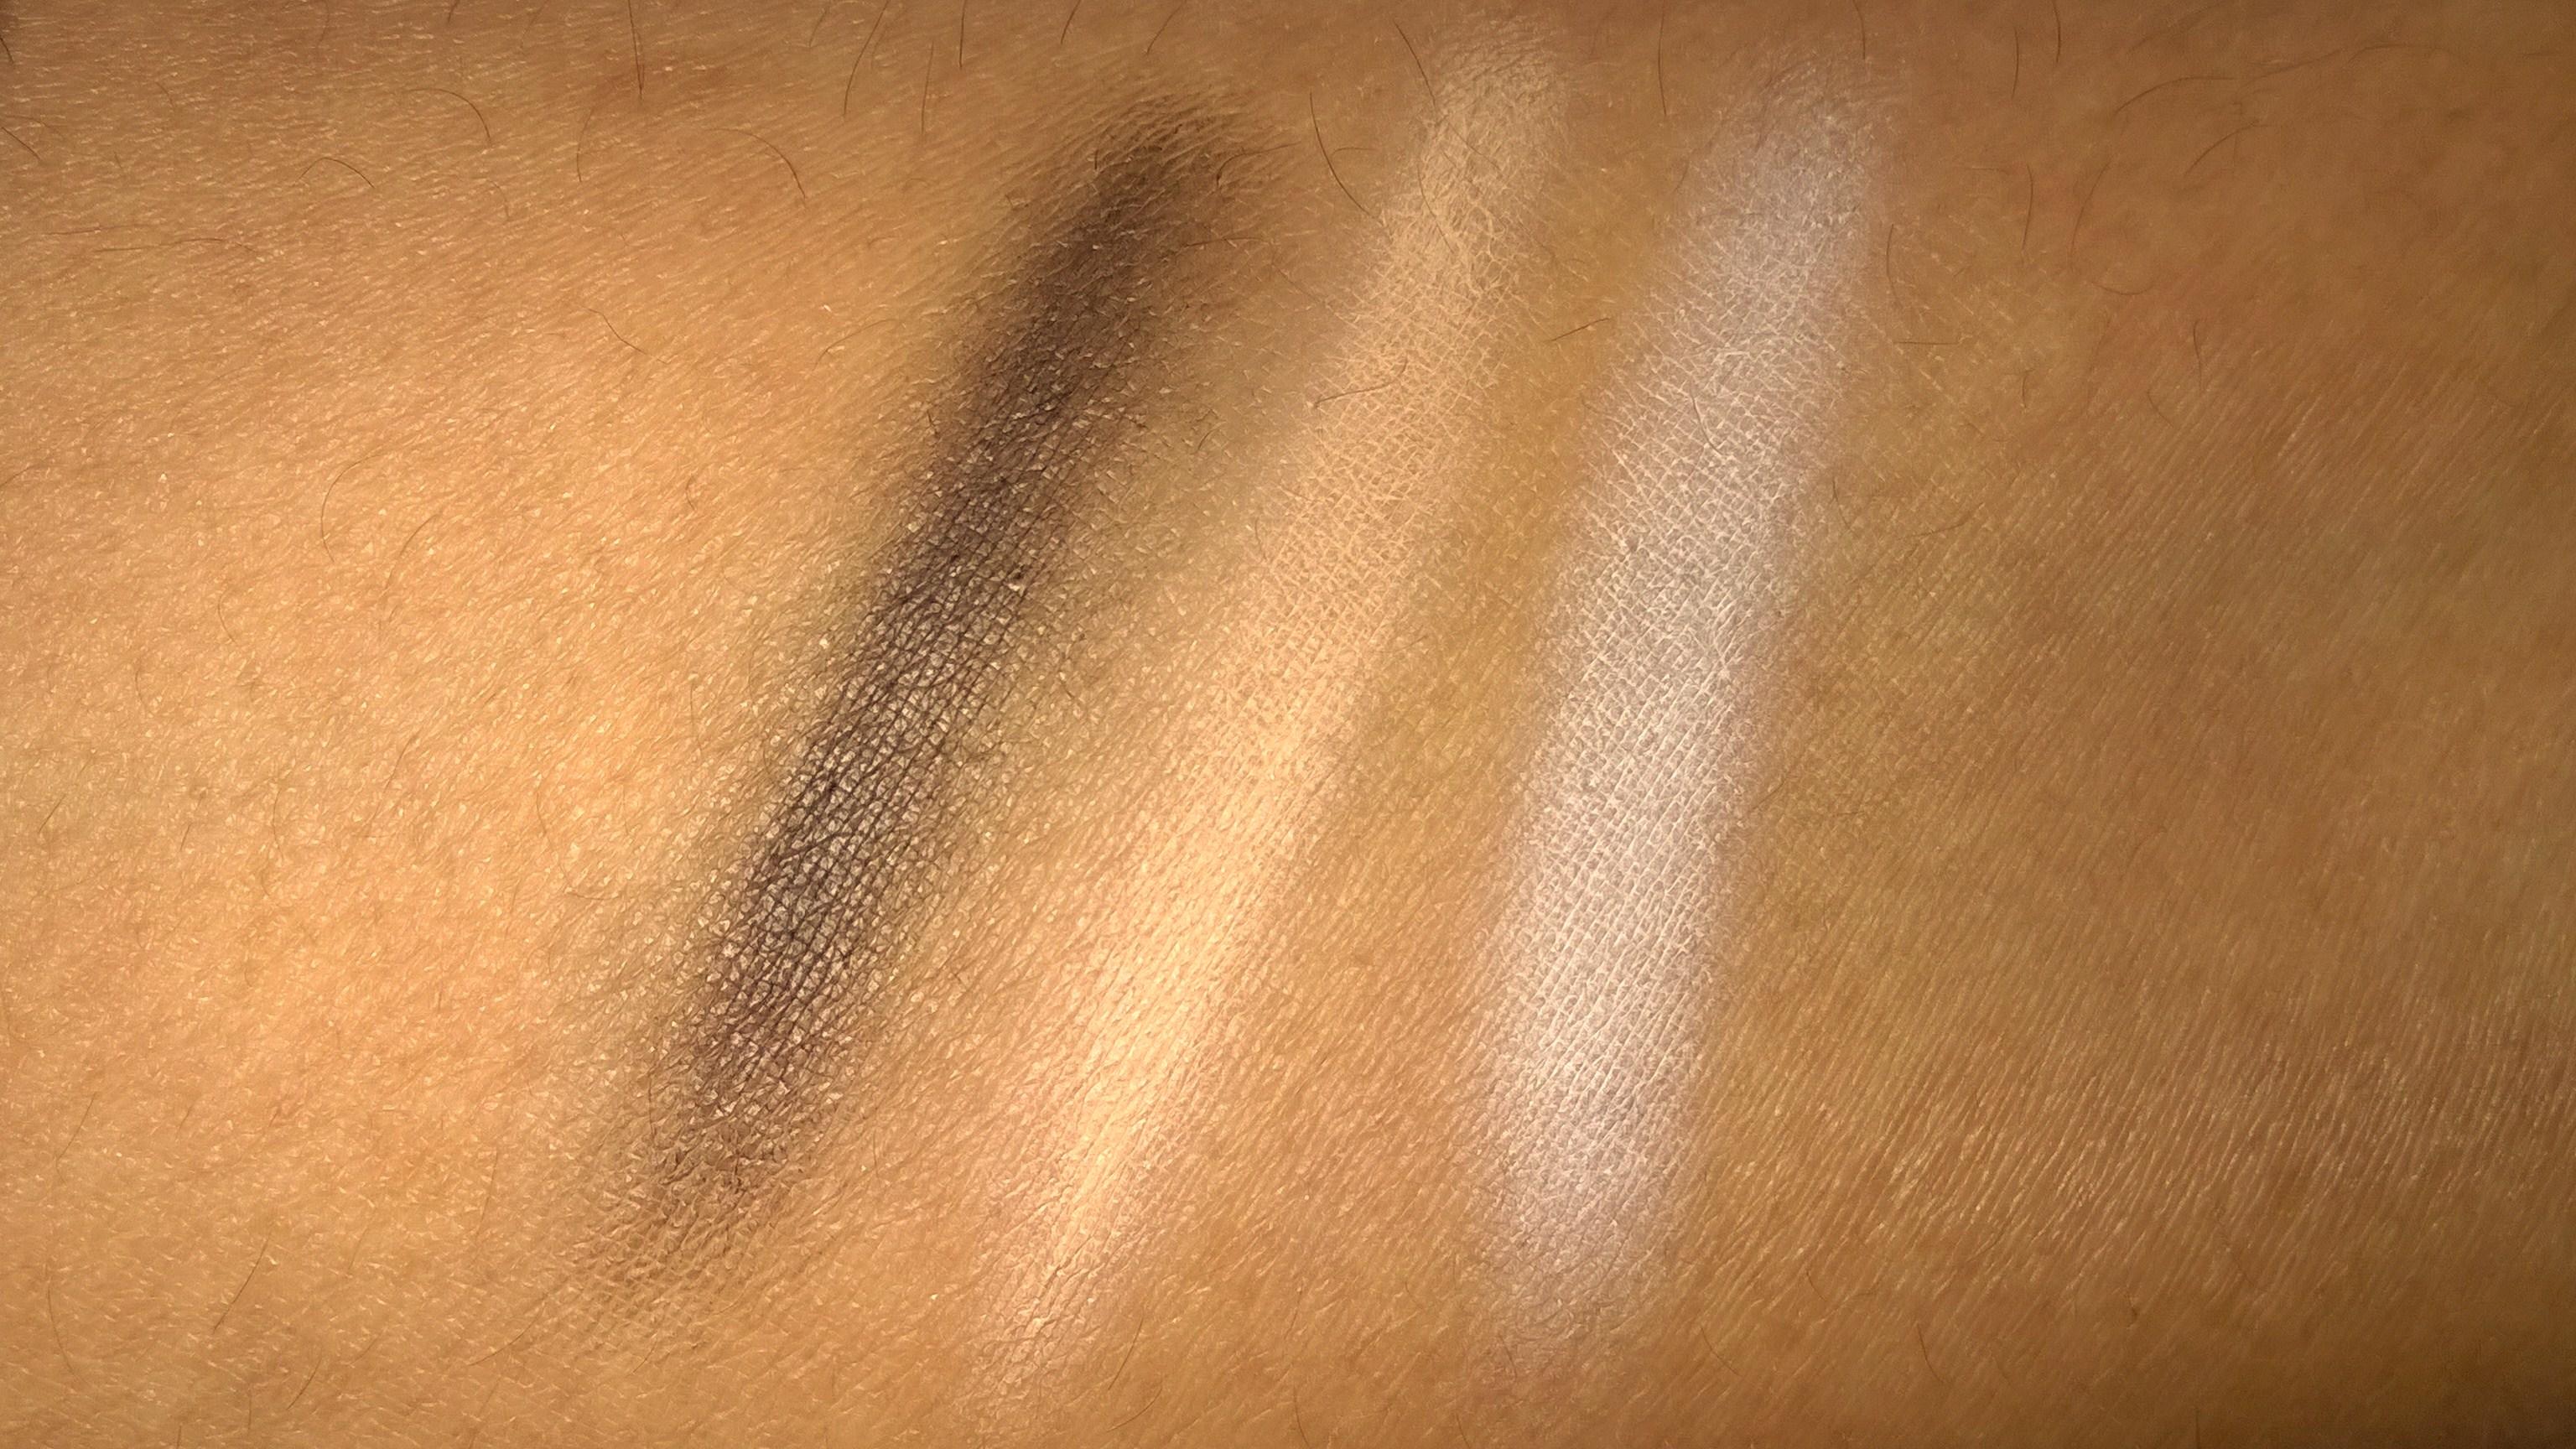 La Girl Hd Pro Eyeshadow Primer Review Nur Al Ayn Beauty Prep Blended